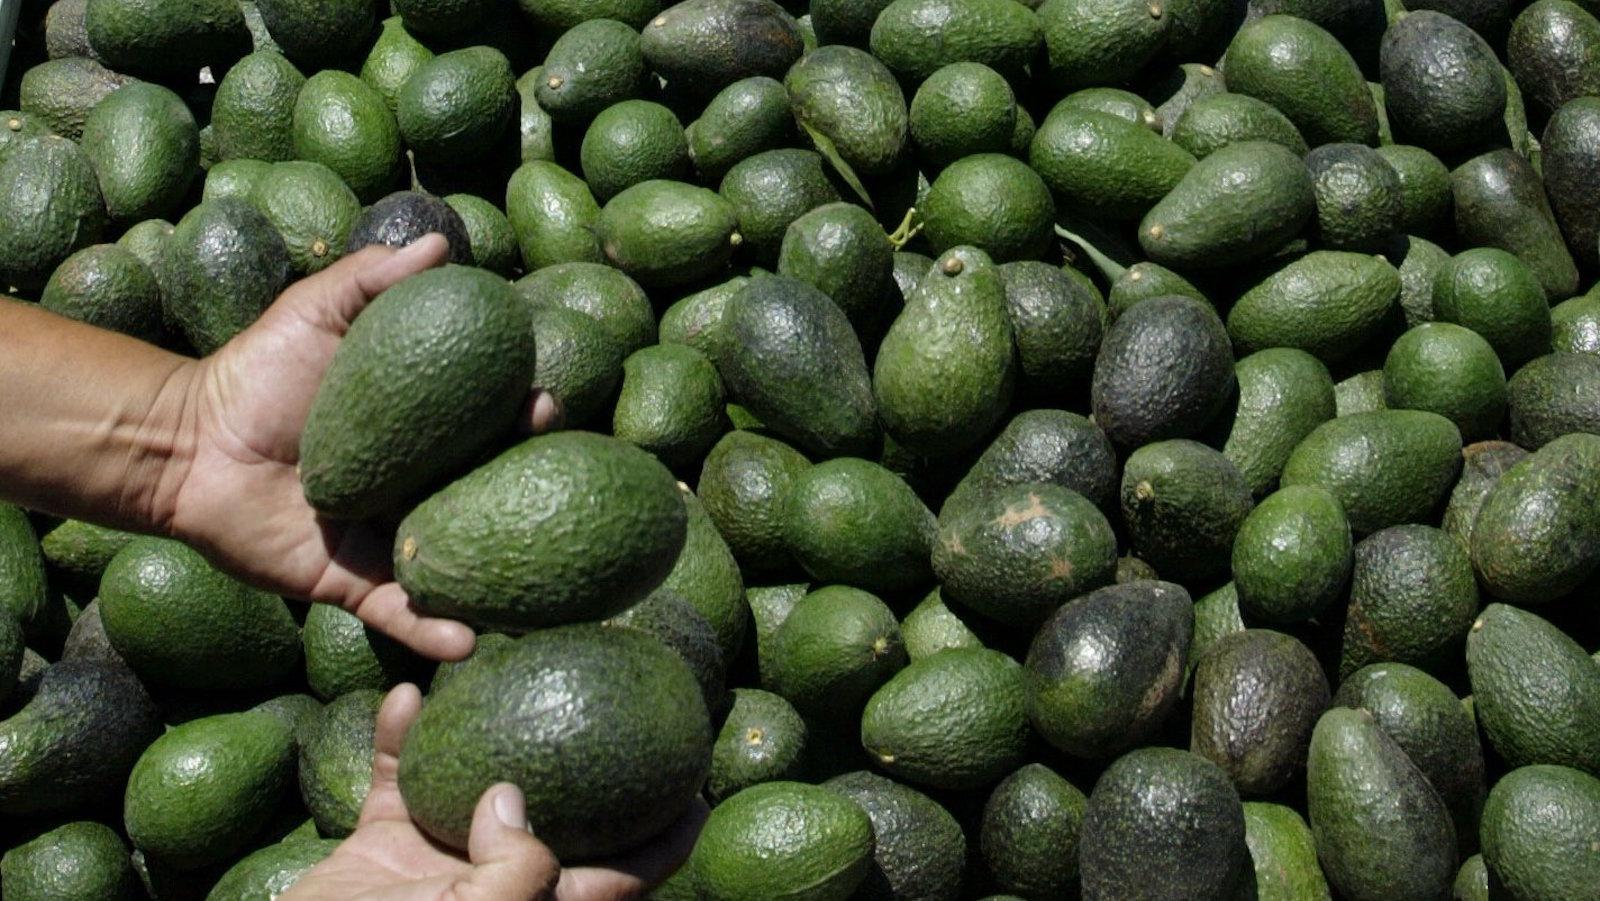 man holding avocados